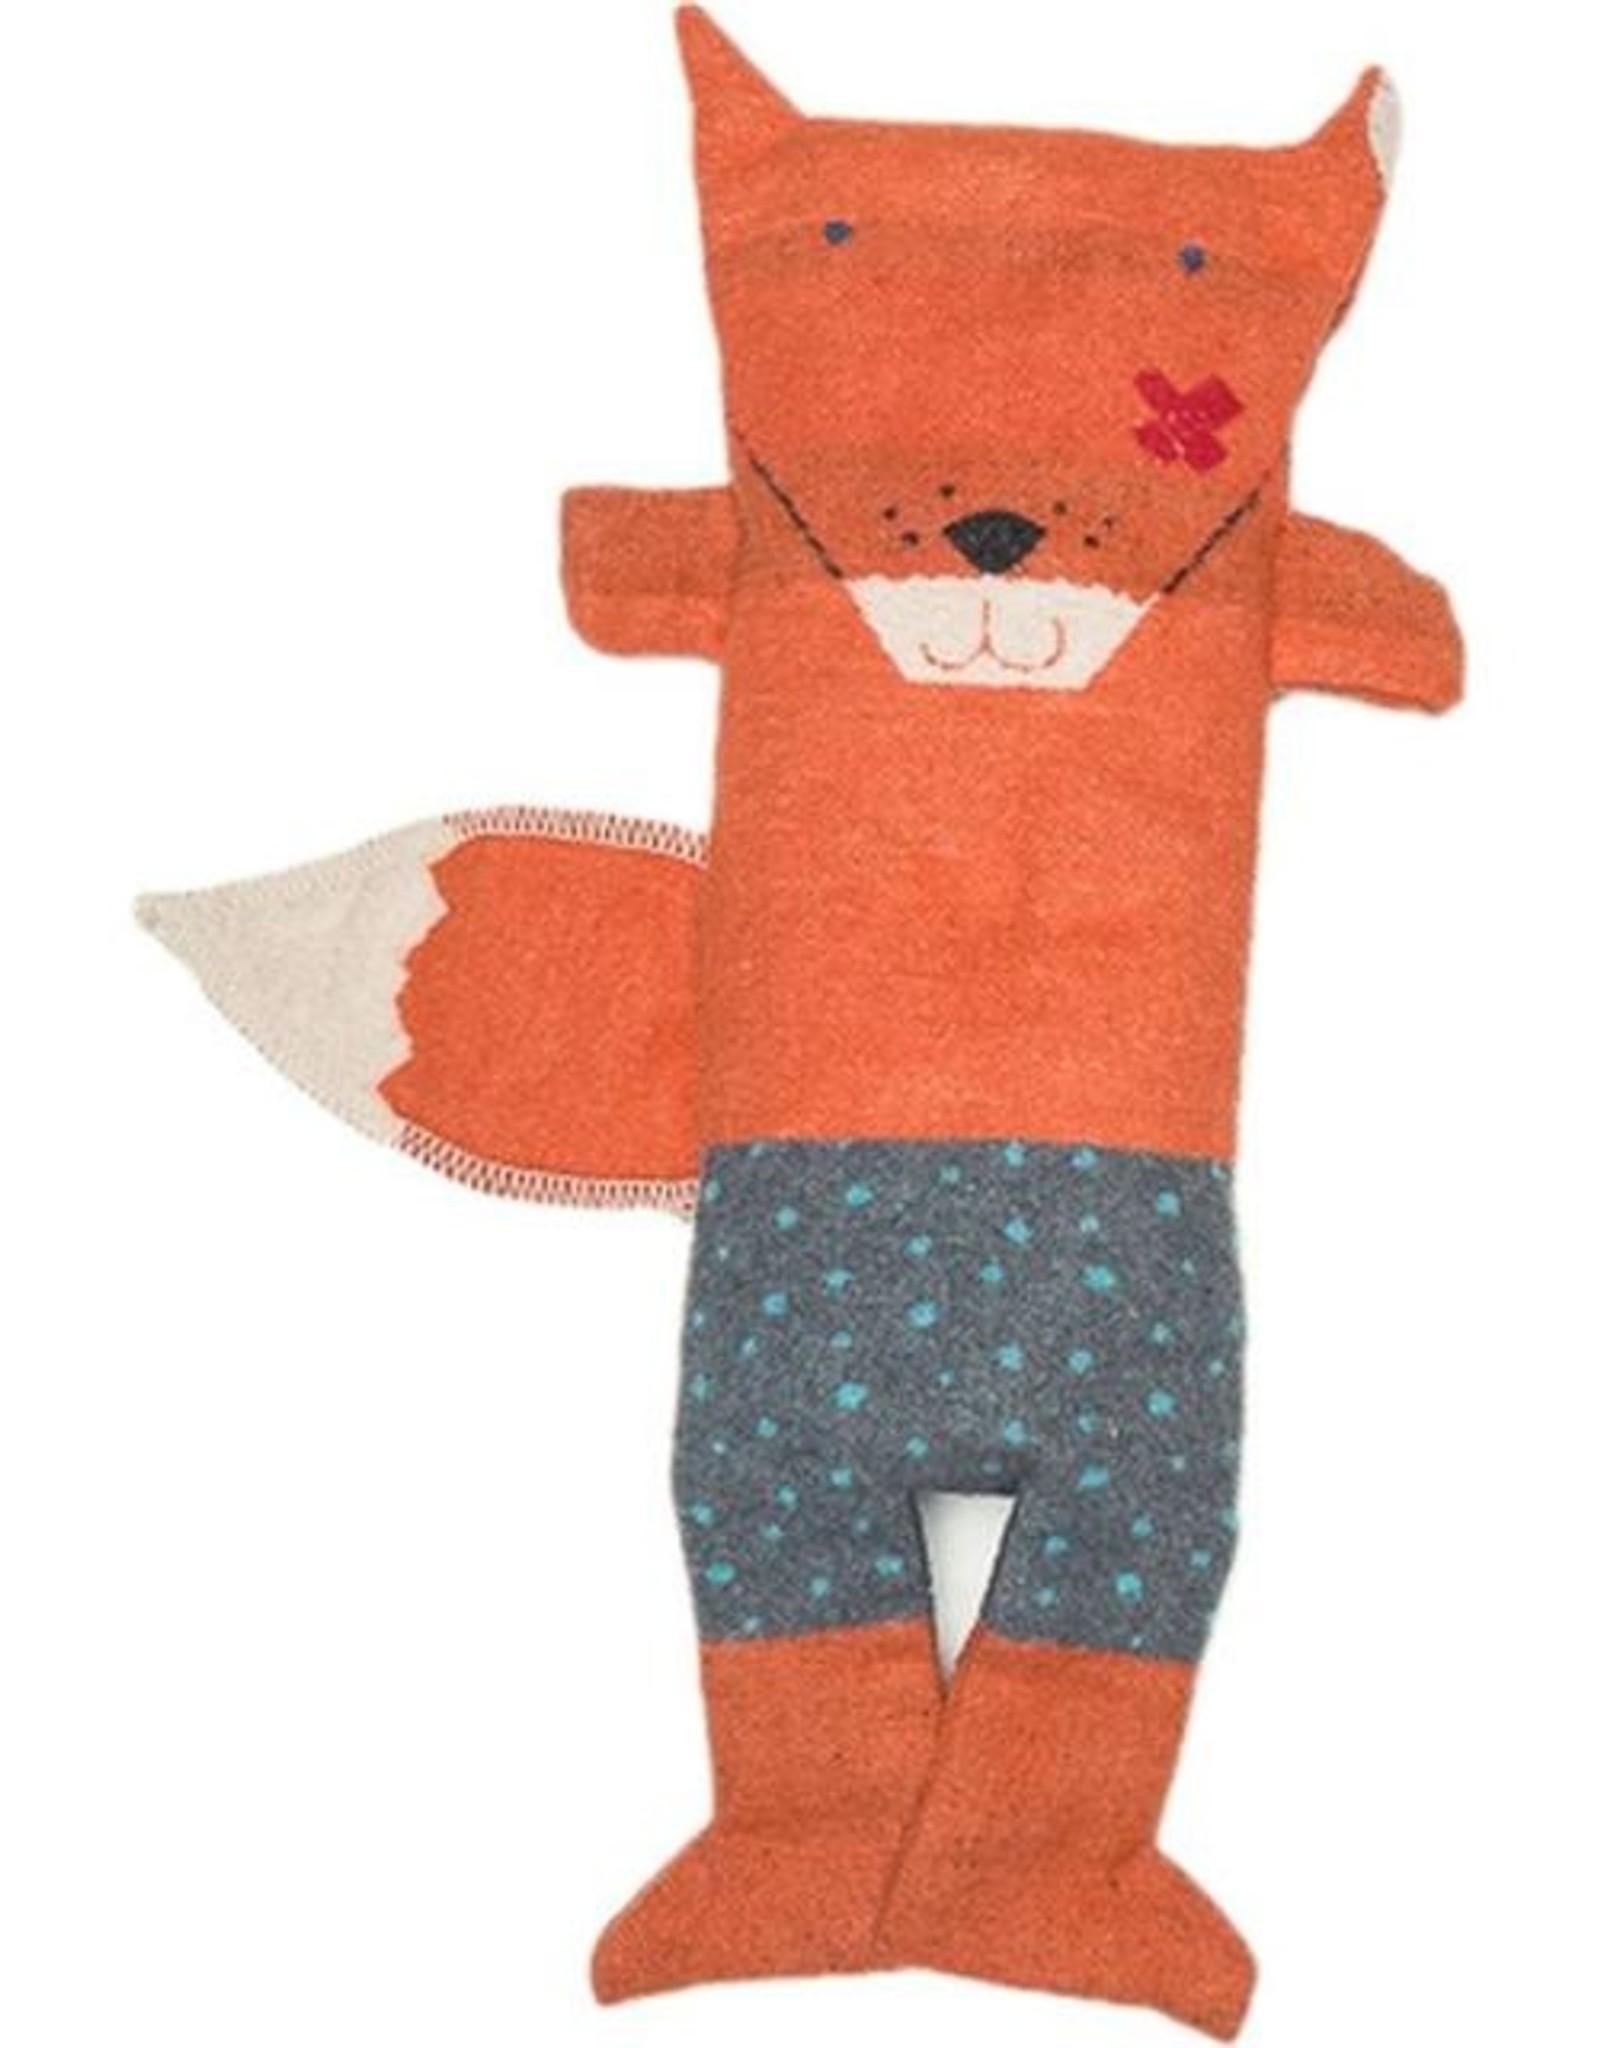 Snuggly Buddy Blanket & Puppet Set - Fox